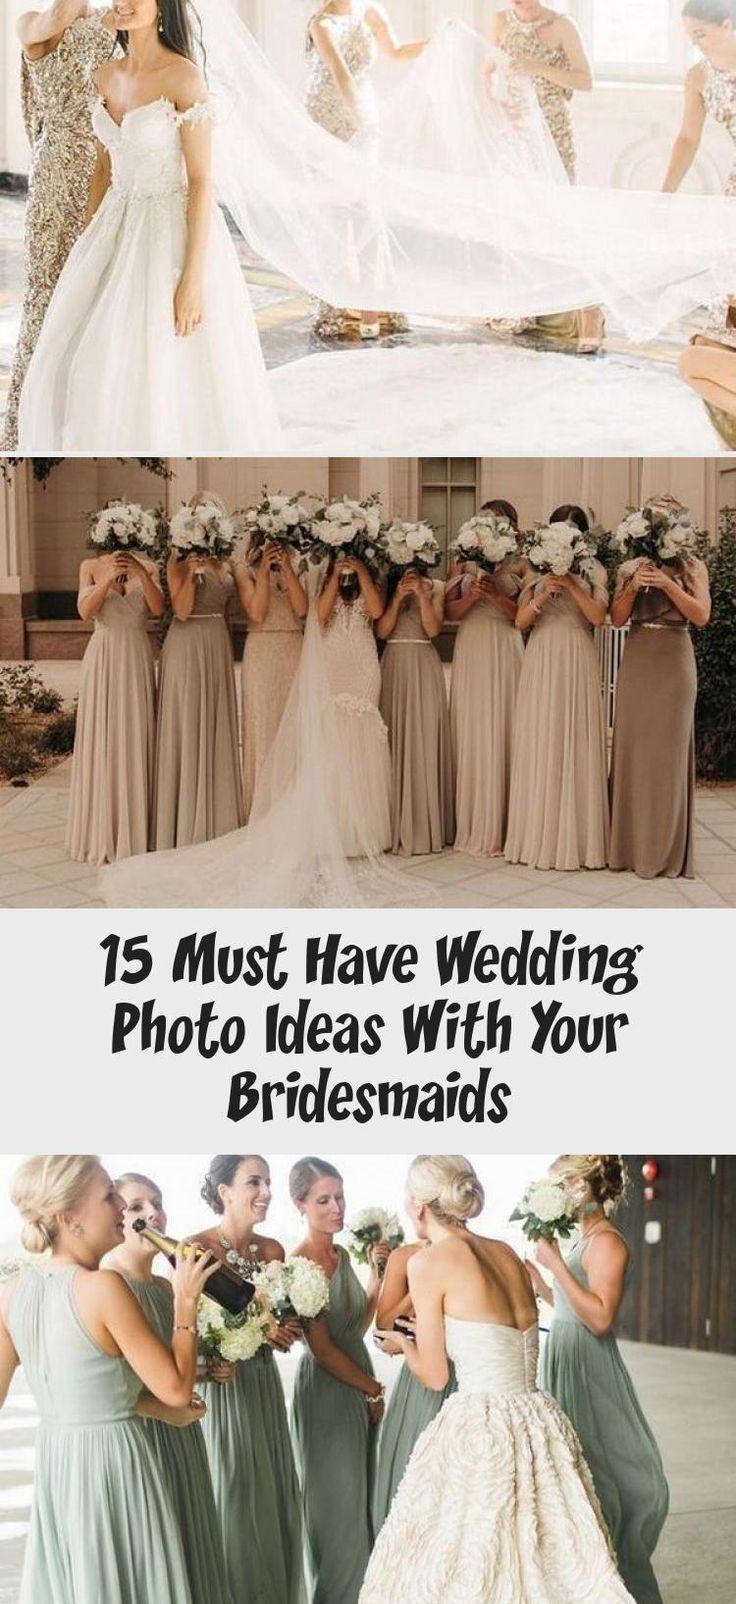 neutral colored bridesmaid dresses #BridesmaidDressesColors #MixAndMatchBridesmaidDresses #LilacBridesmaidDresses #BlushBridesmaidDresses #GoldBridesmaidDresses